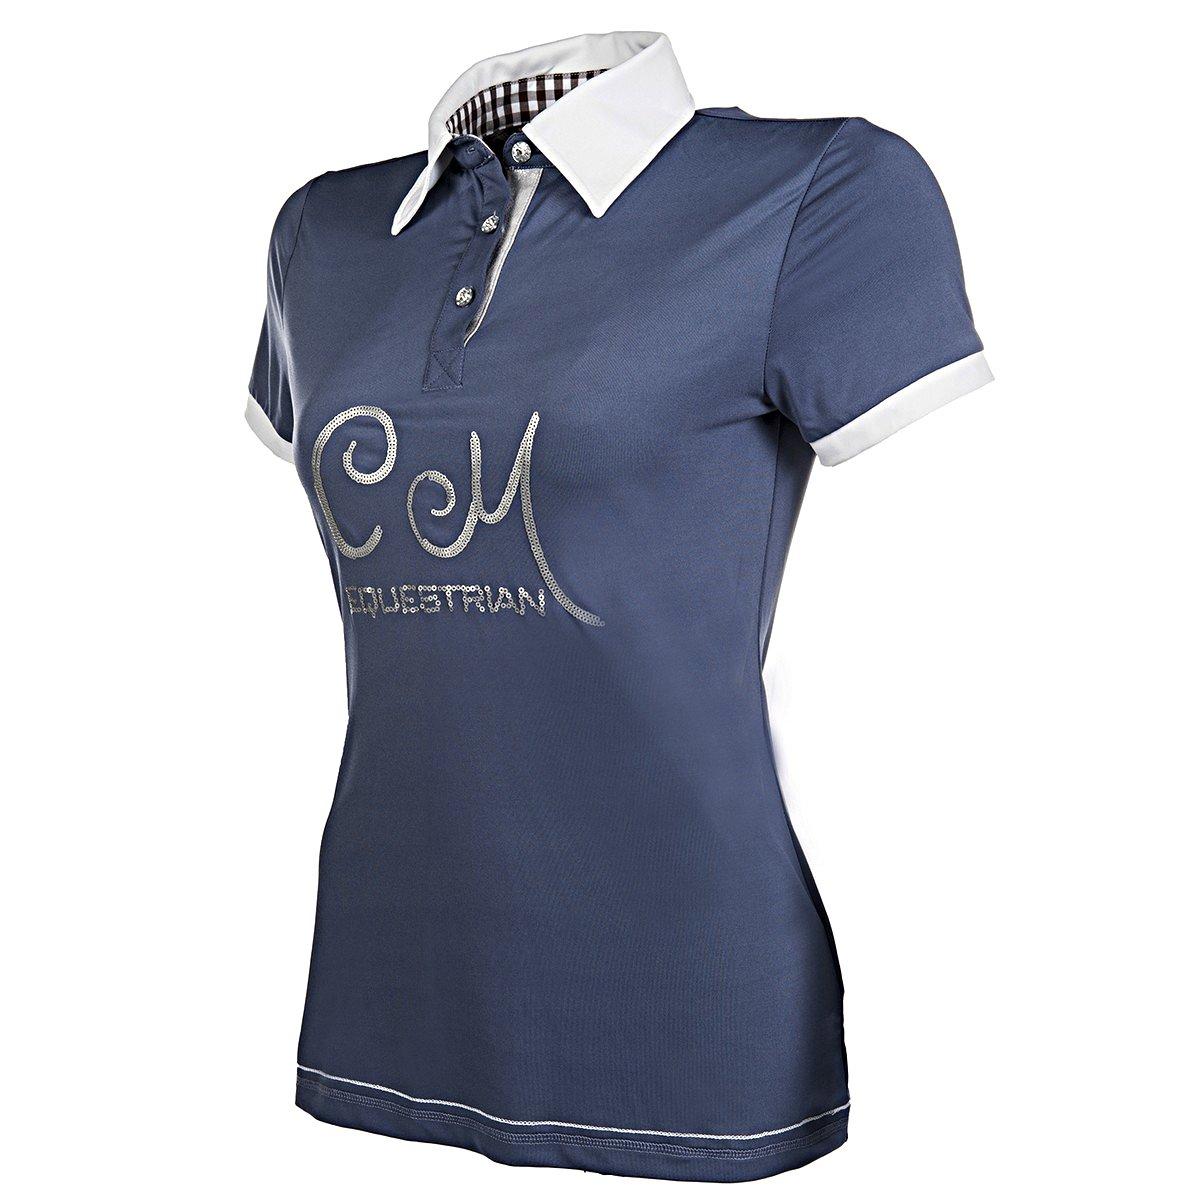 Afbeelding van Cavallino Marino Dames poloshirt Soft powder blauw XL